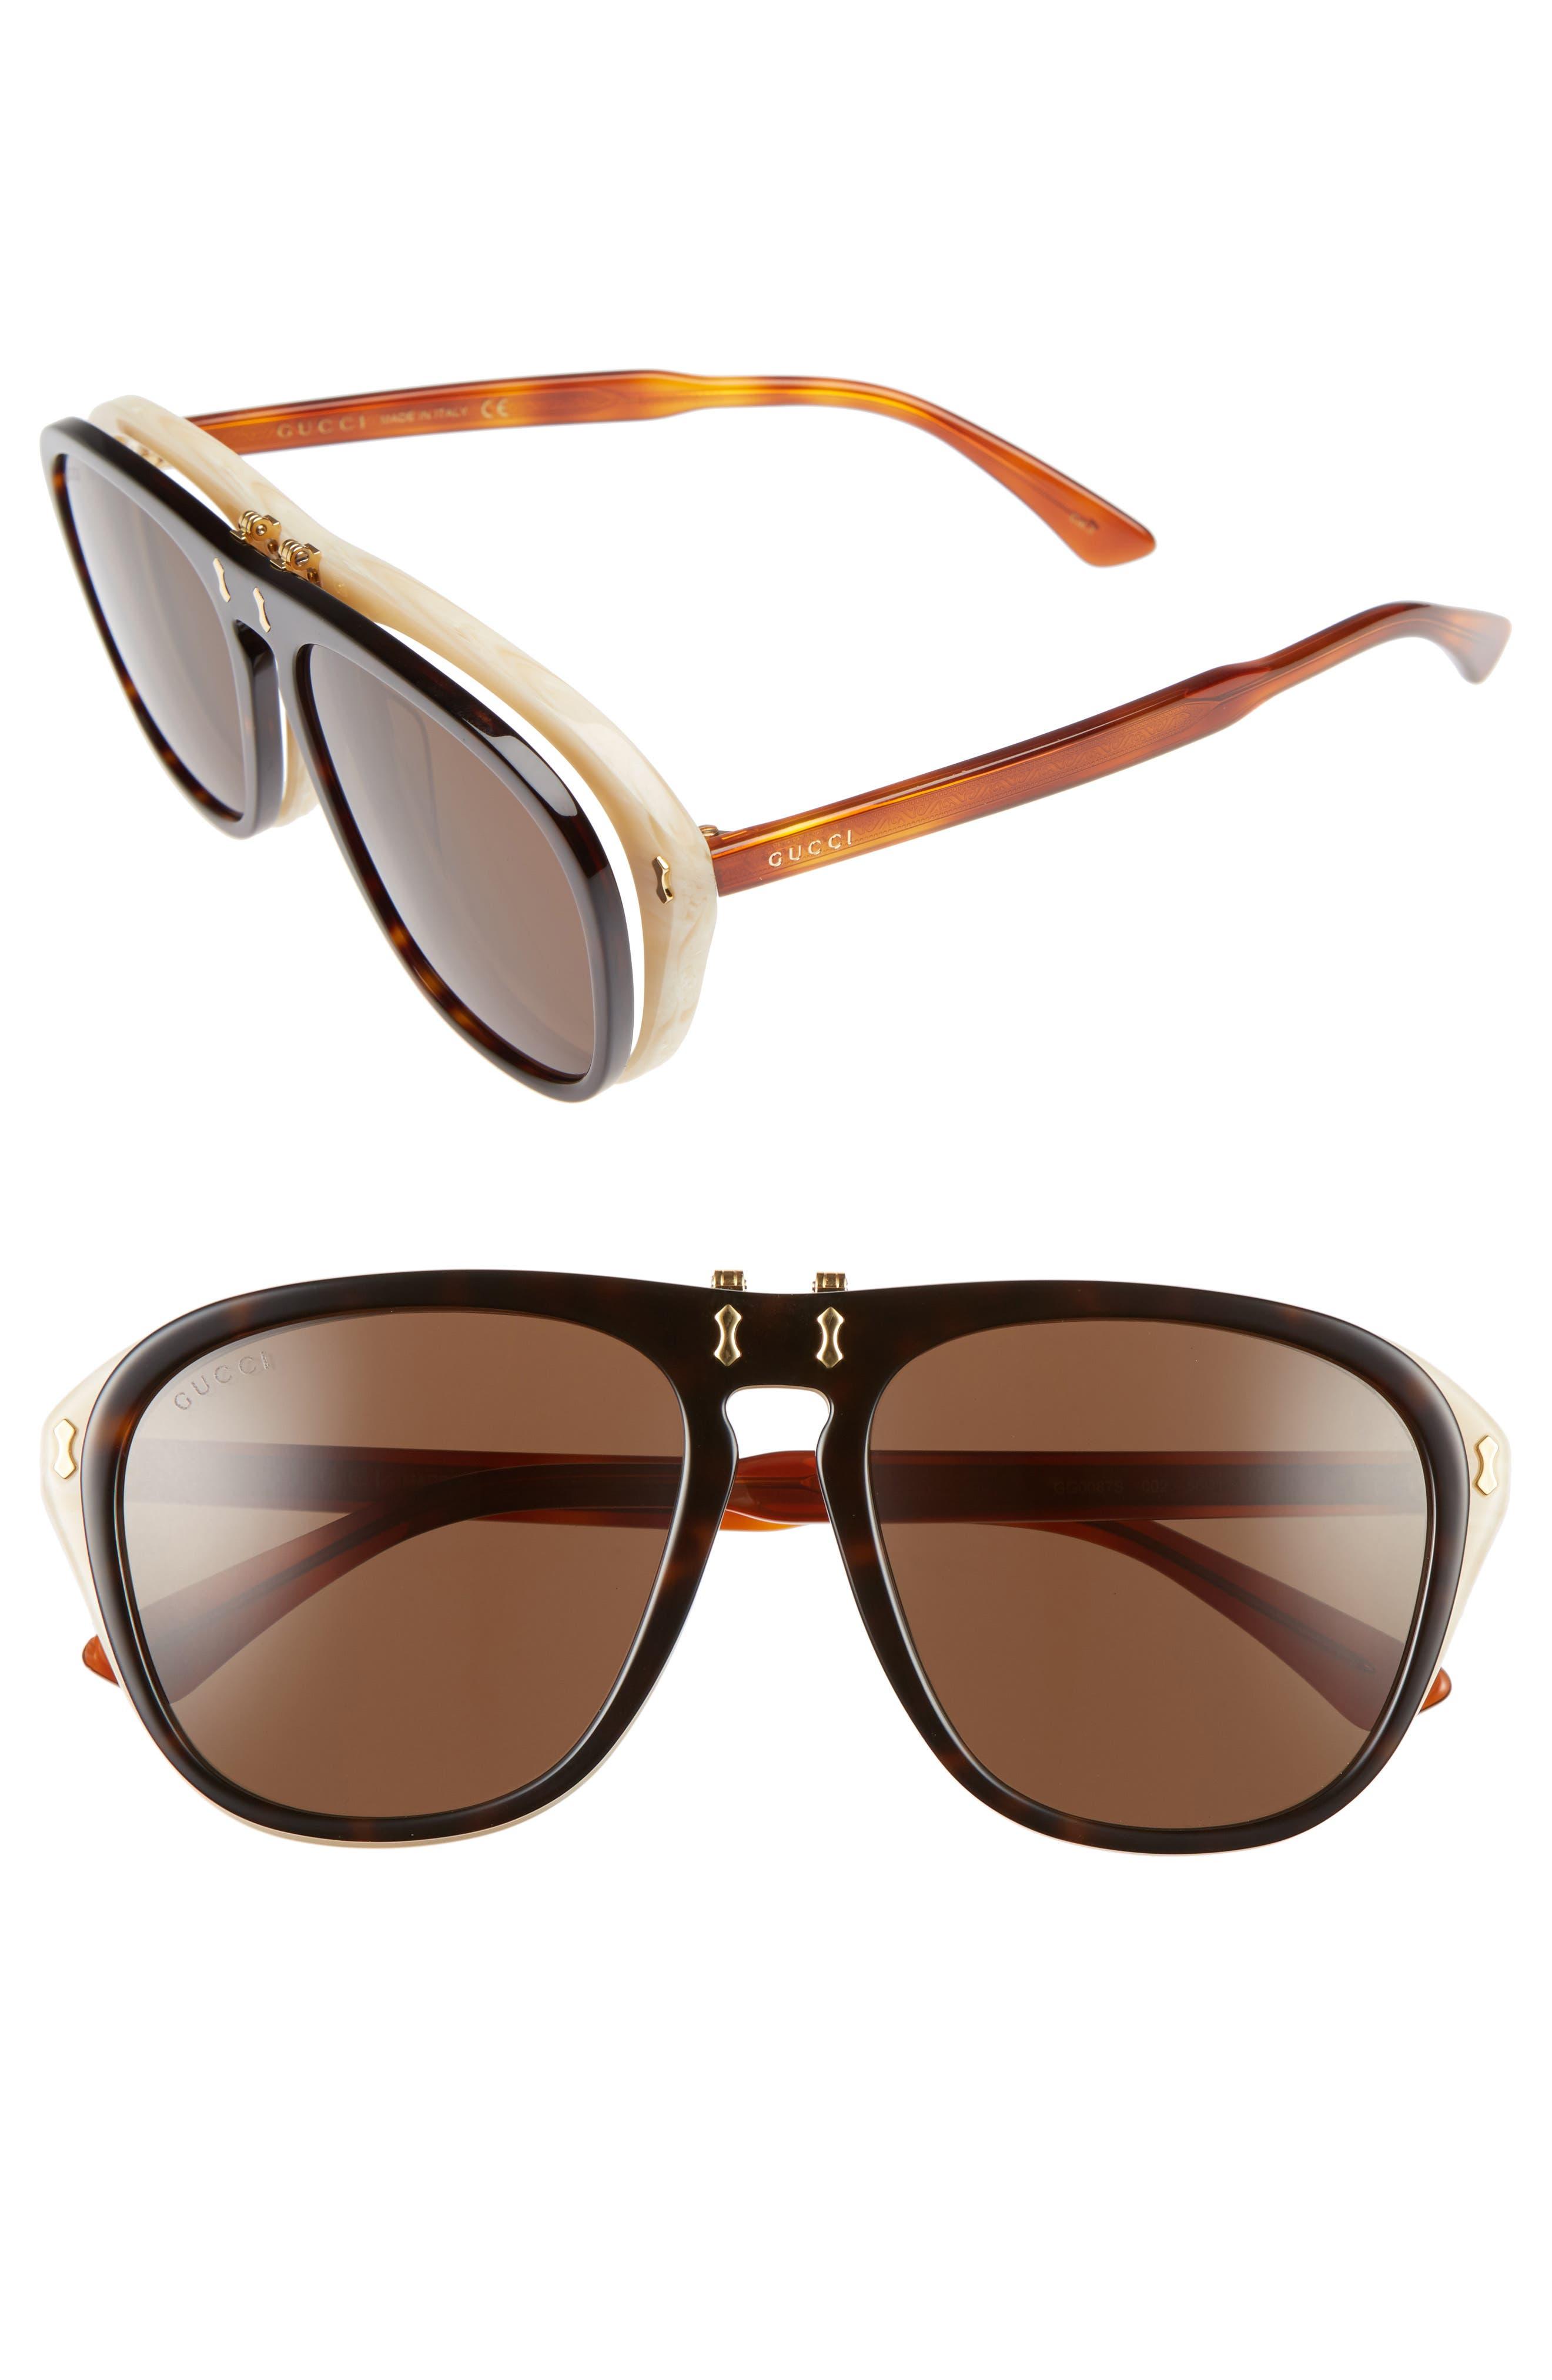 56mm Flip-Up Sunglasses,                             Main thumbnail 1, color,                             HAVANA/ BROWN